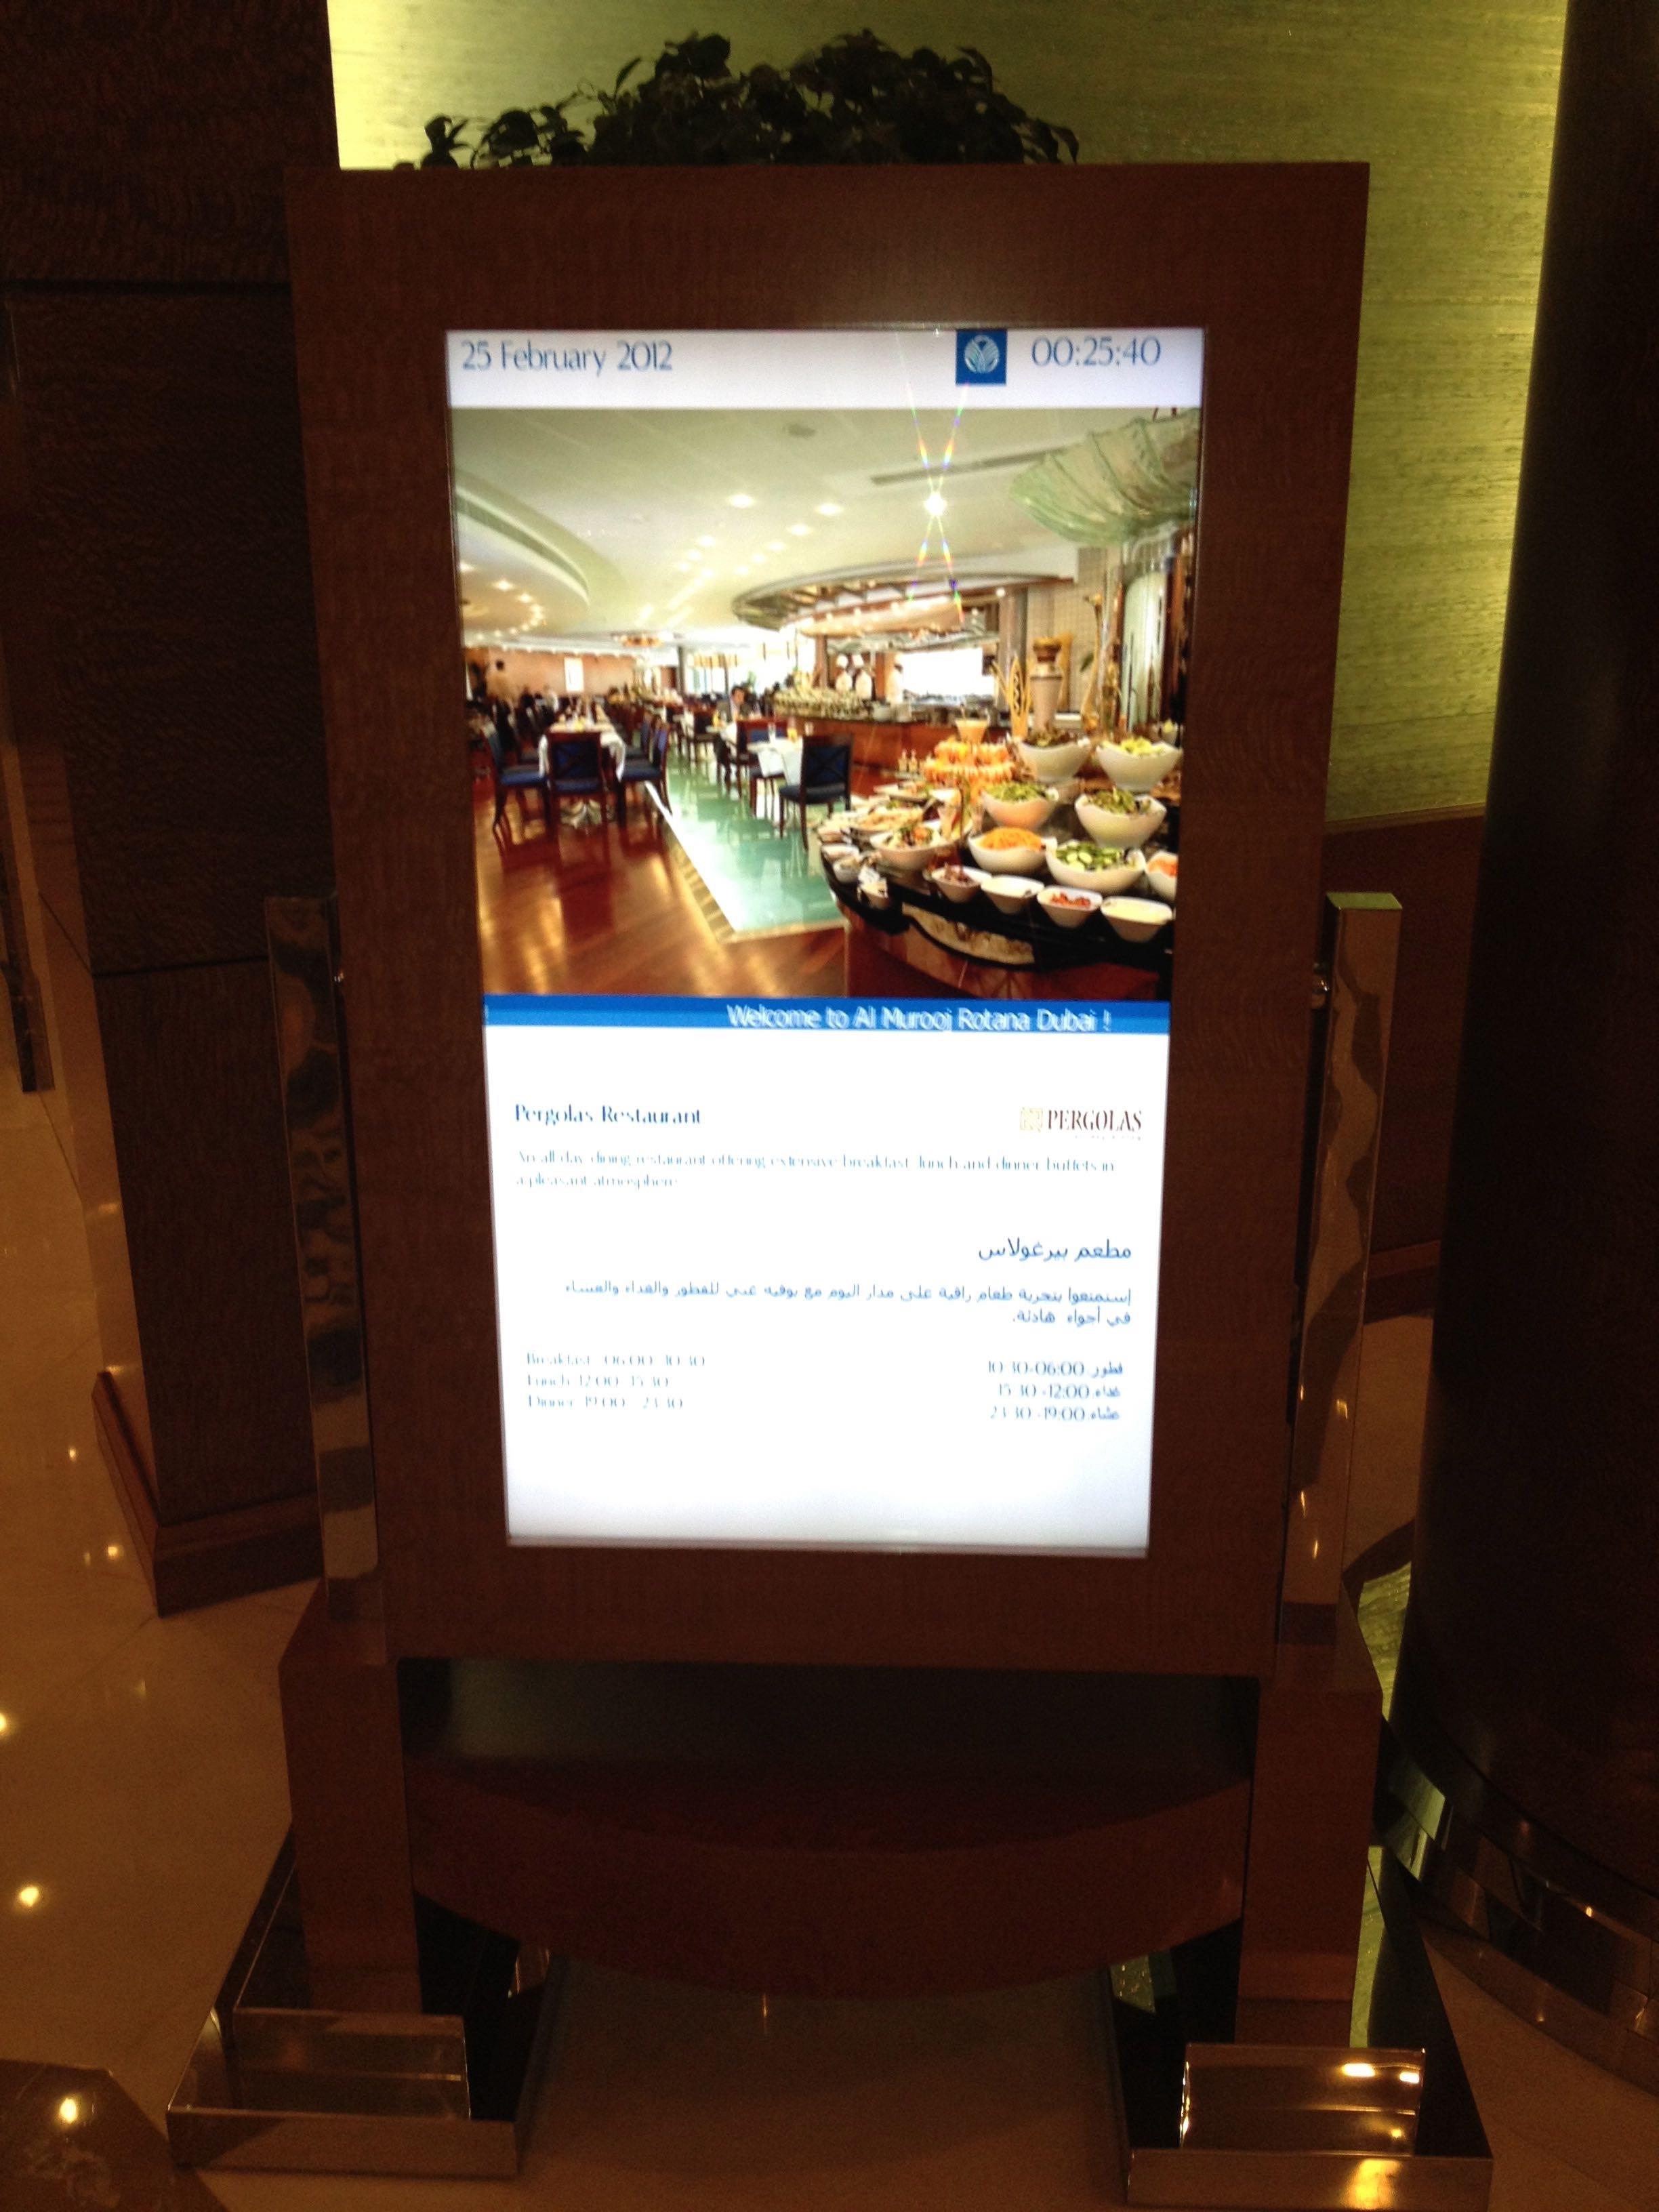 Rotana Hotel Digital Signage